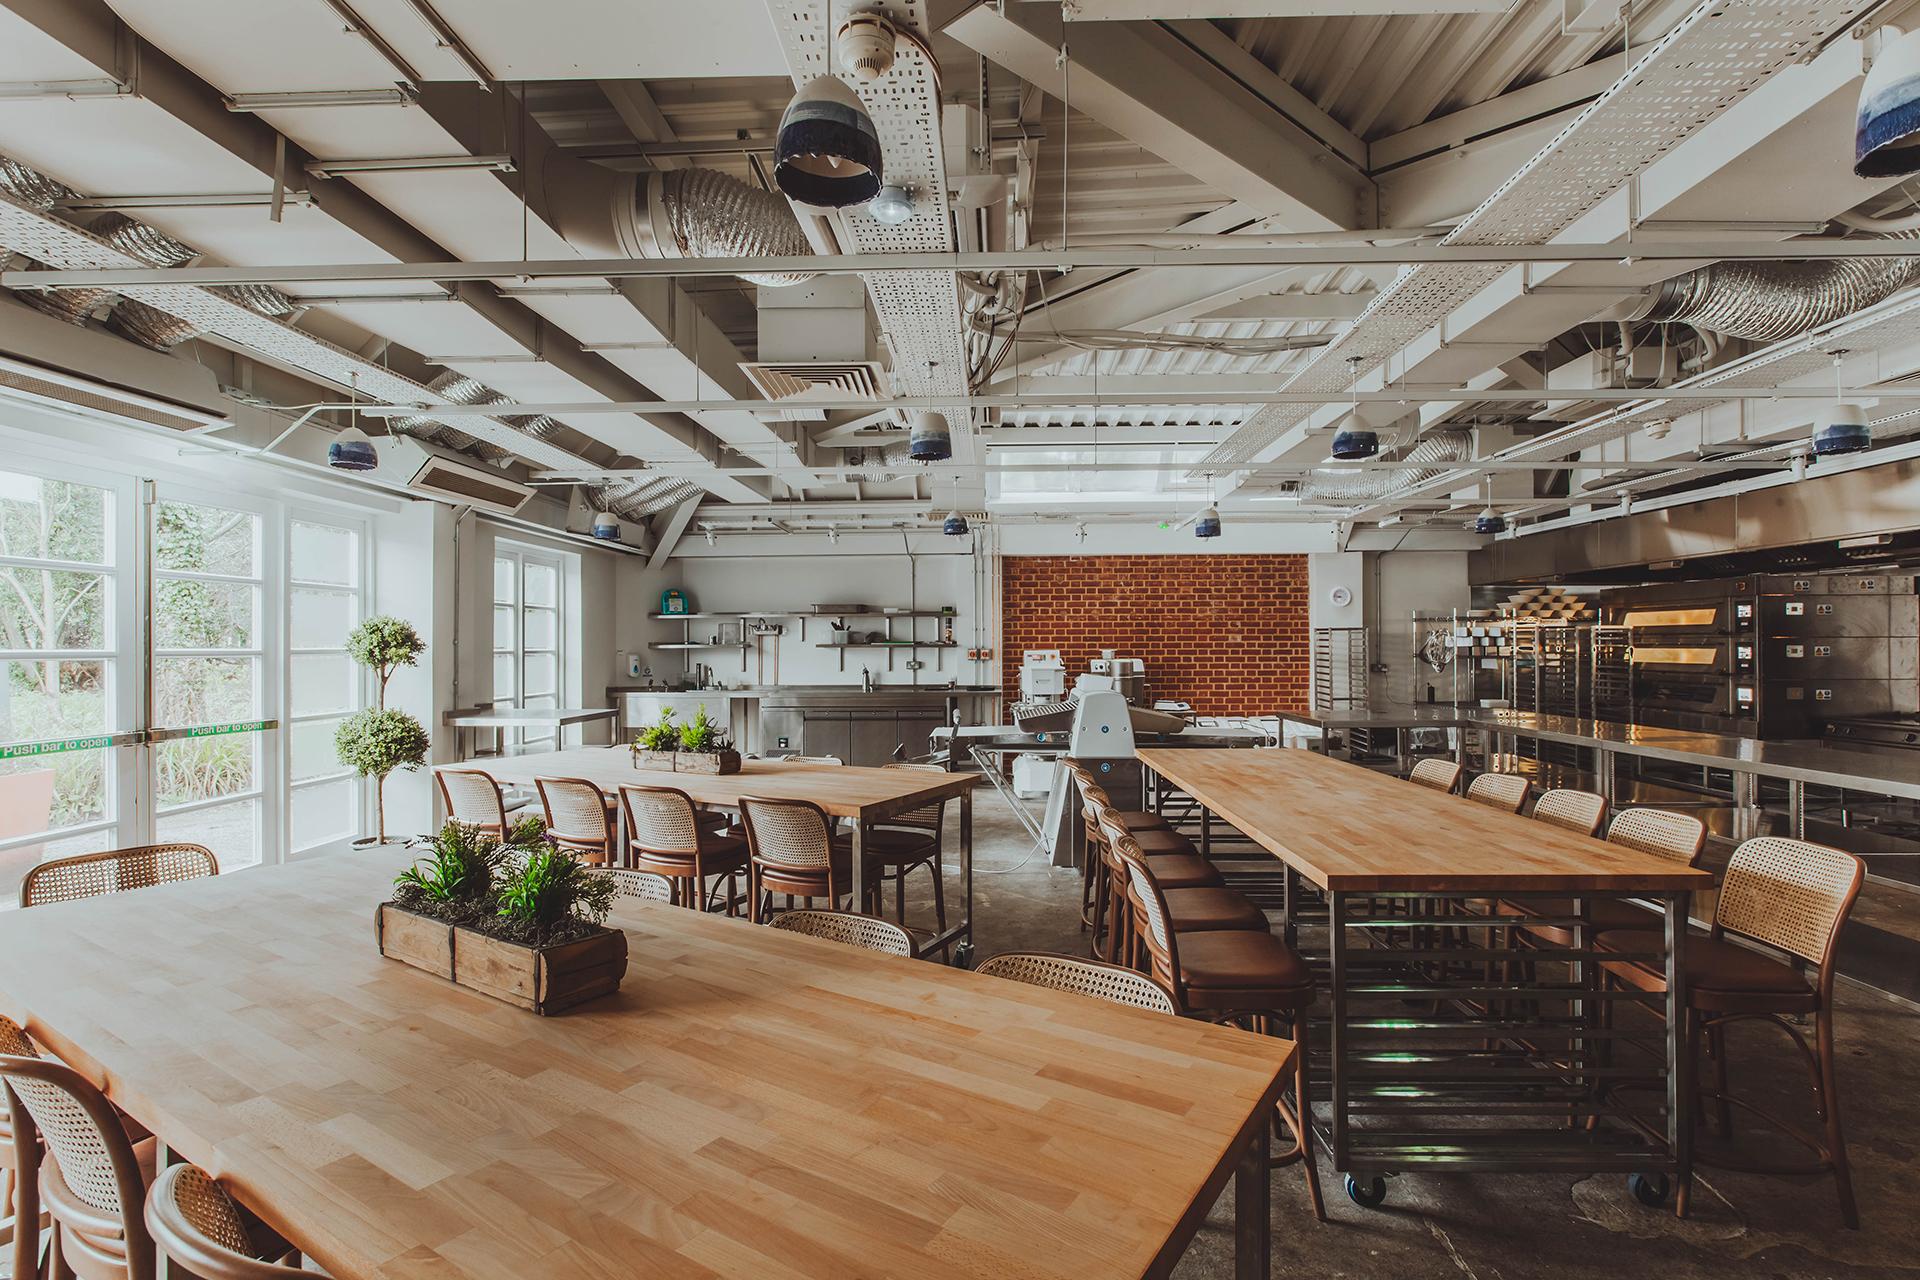 Interactive Bakery. Photo by Adam Firman.